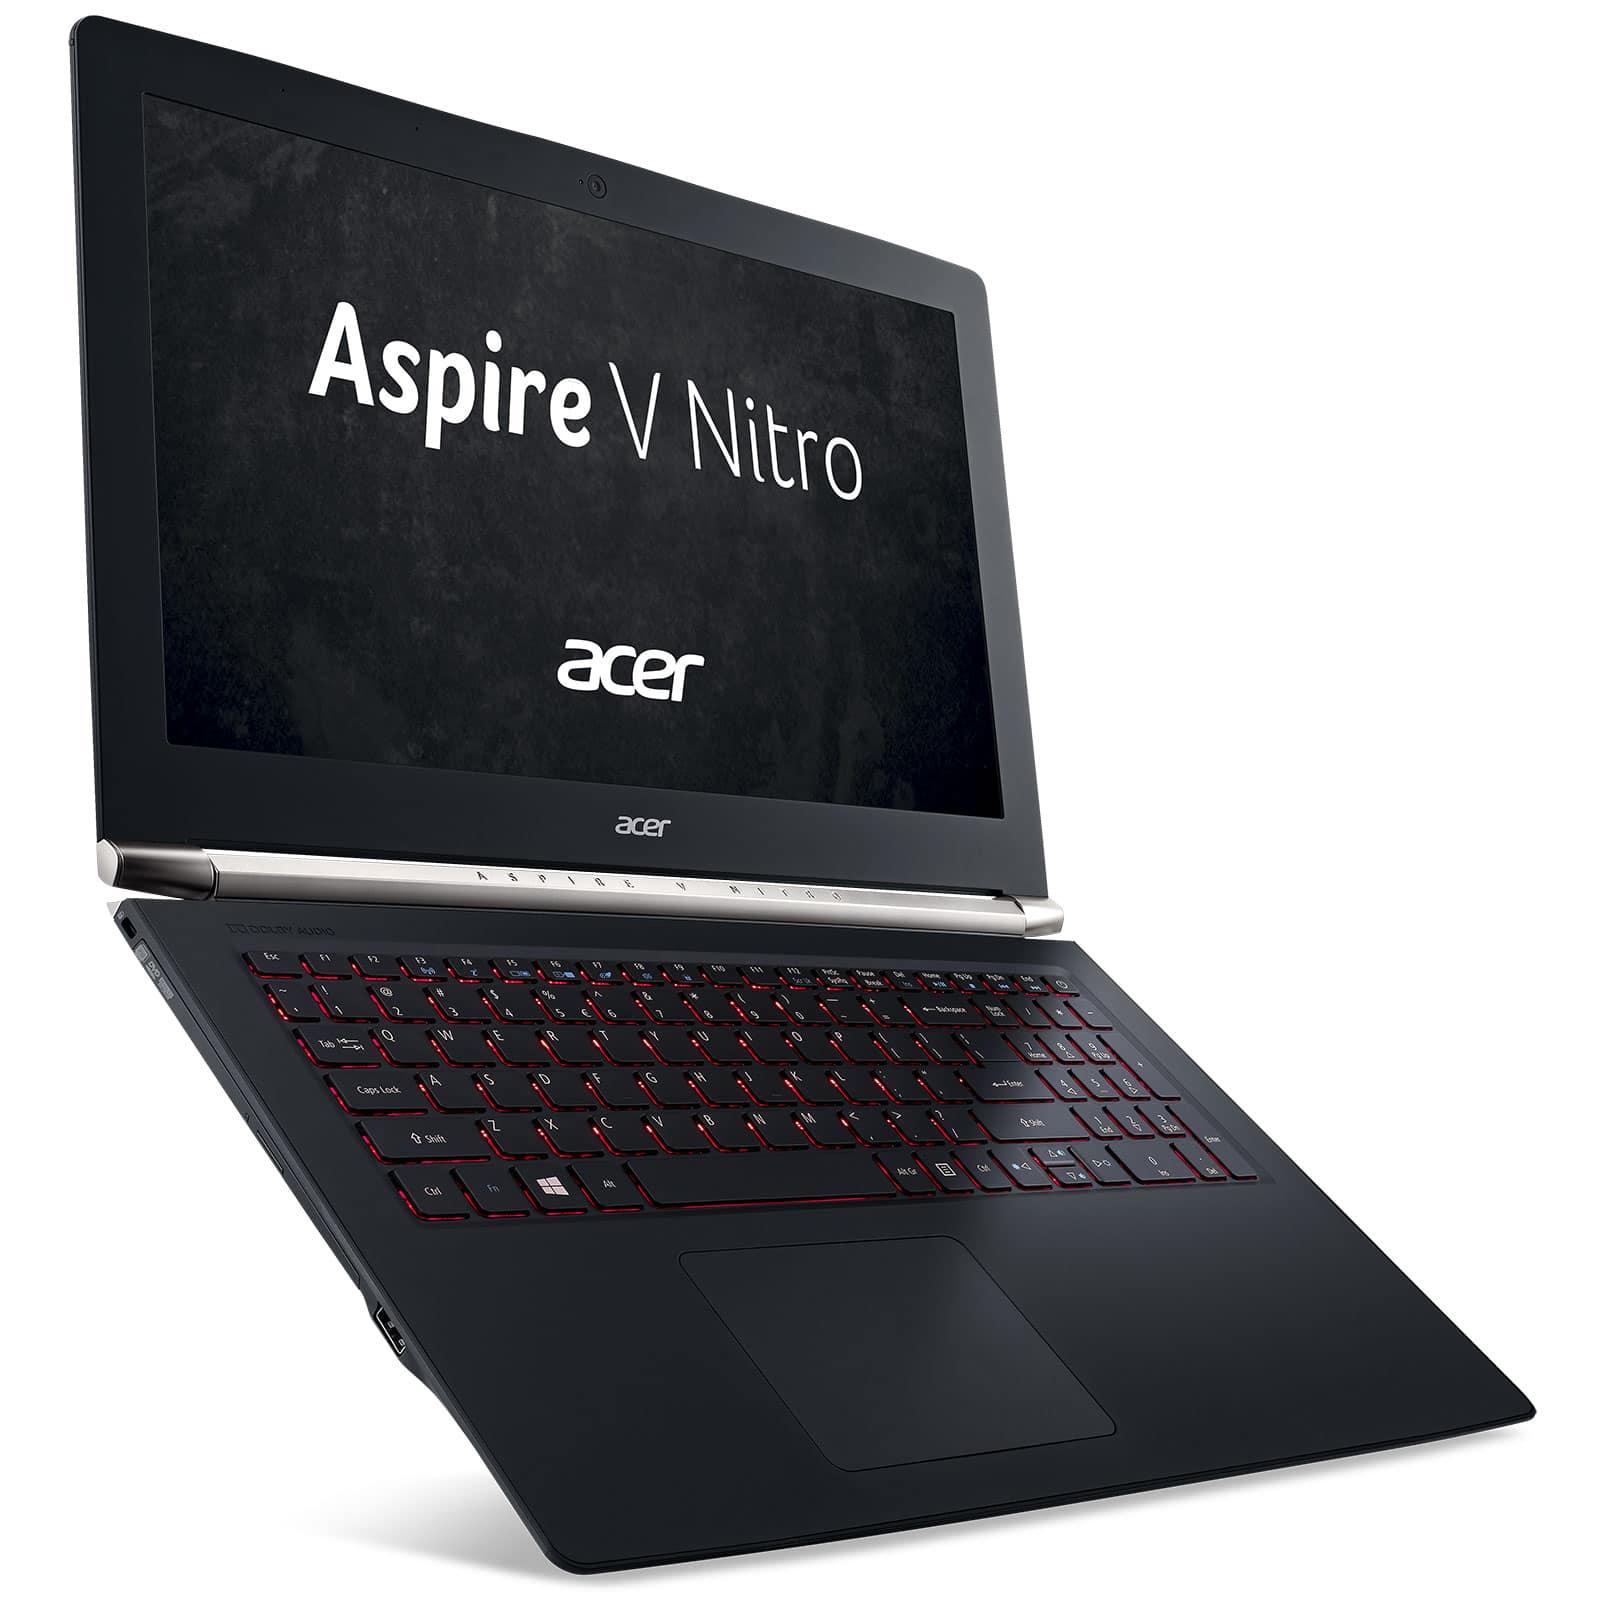 "<span class=""toptagtitre""><del>Soldes ! </span>Acer Nitro VN7-792G-765X, PC portable 17 pouces Full IPS i7 950M à 849€</del>"